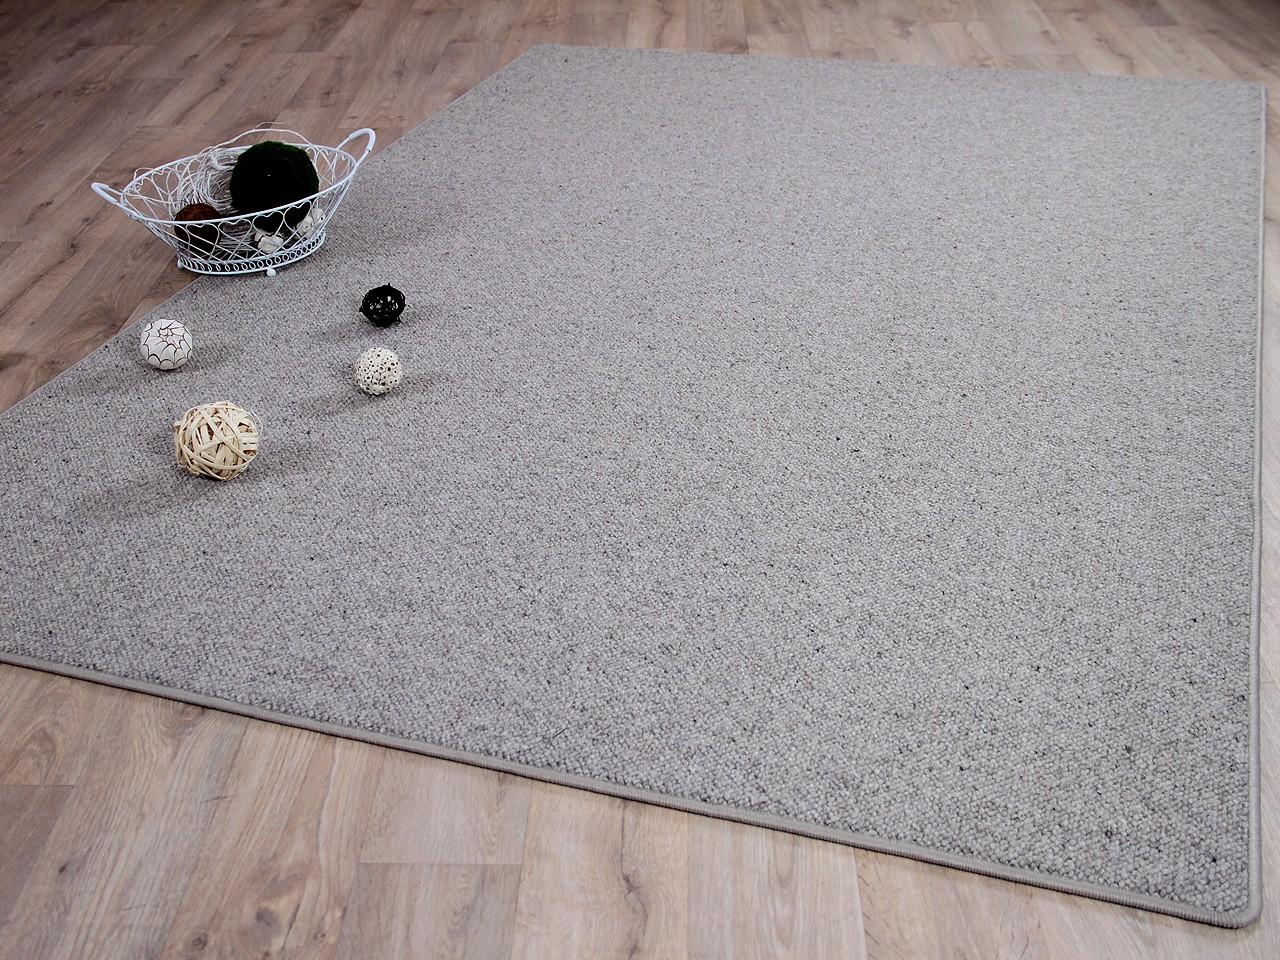 Natur Teppich Wolle Berber Grau Meliert Kaufen Bei Teppichversand24